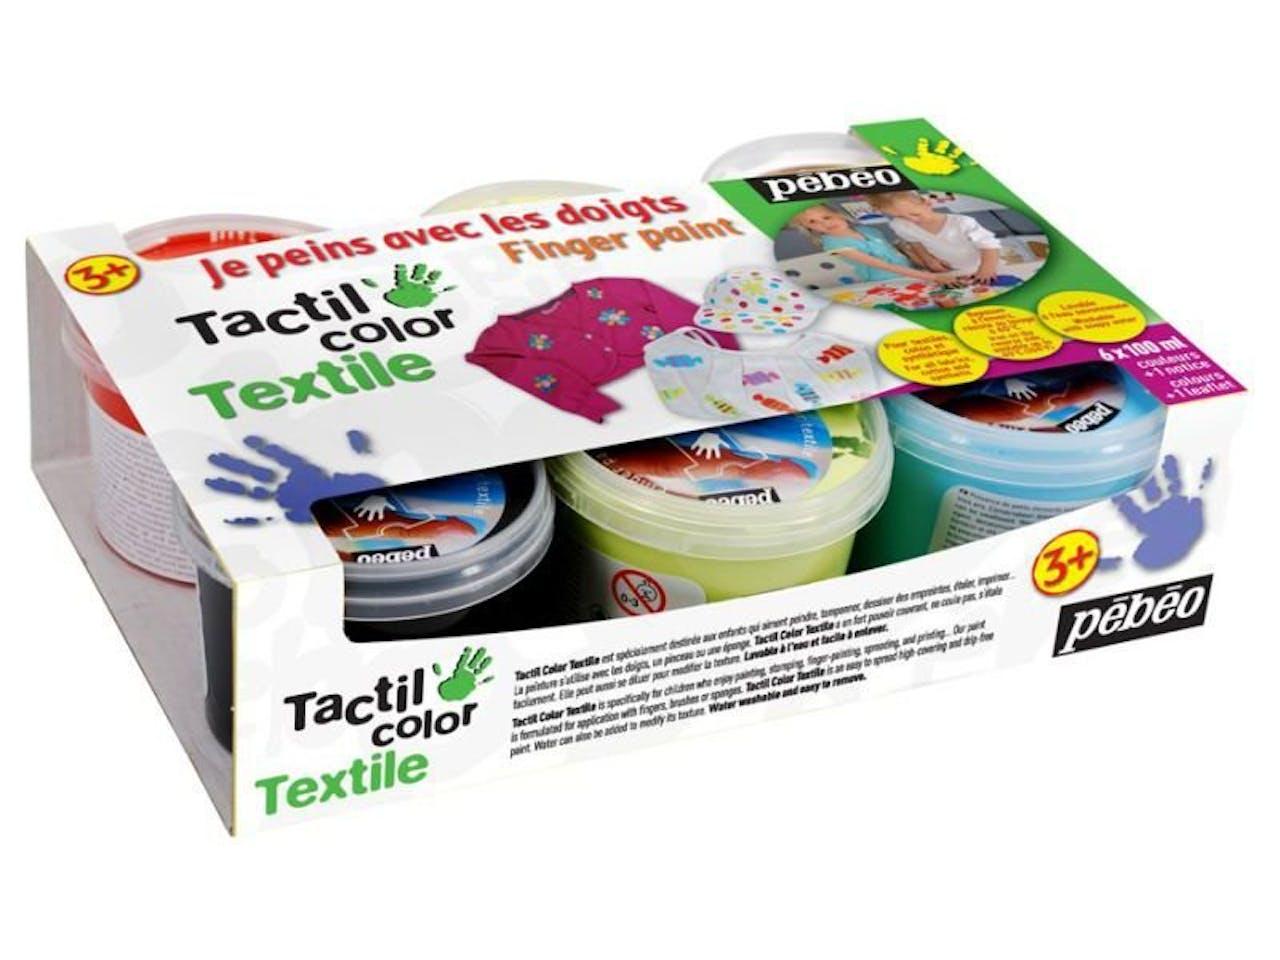 Pebeo Textilfingermalfarbe Finger Paint Textile, 6er-Set Dosen à 100 ml